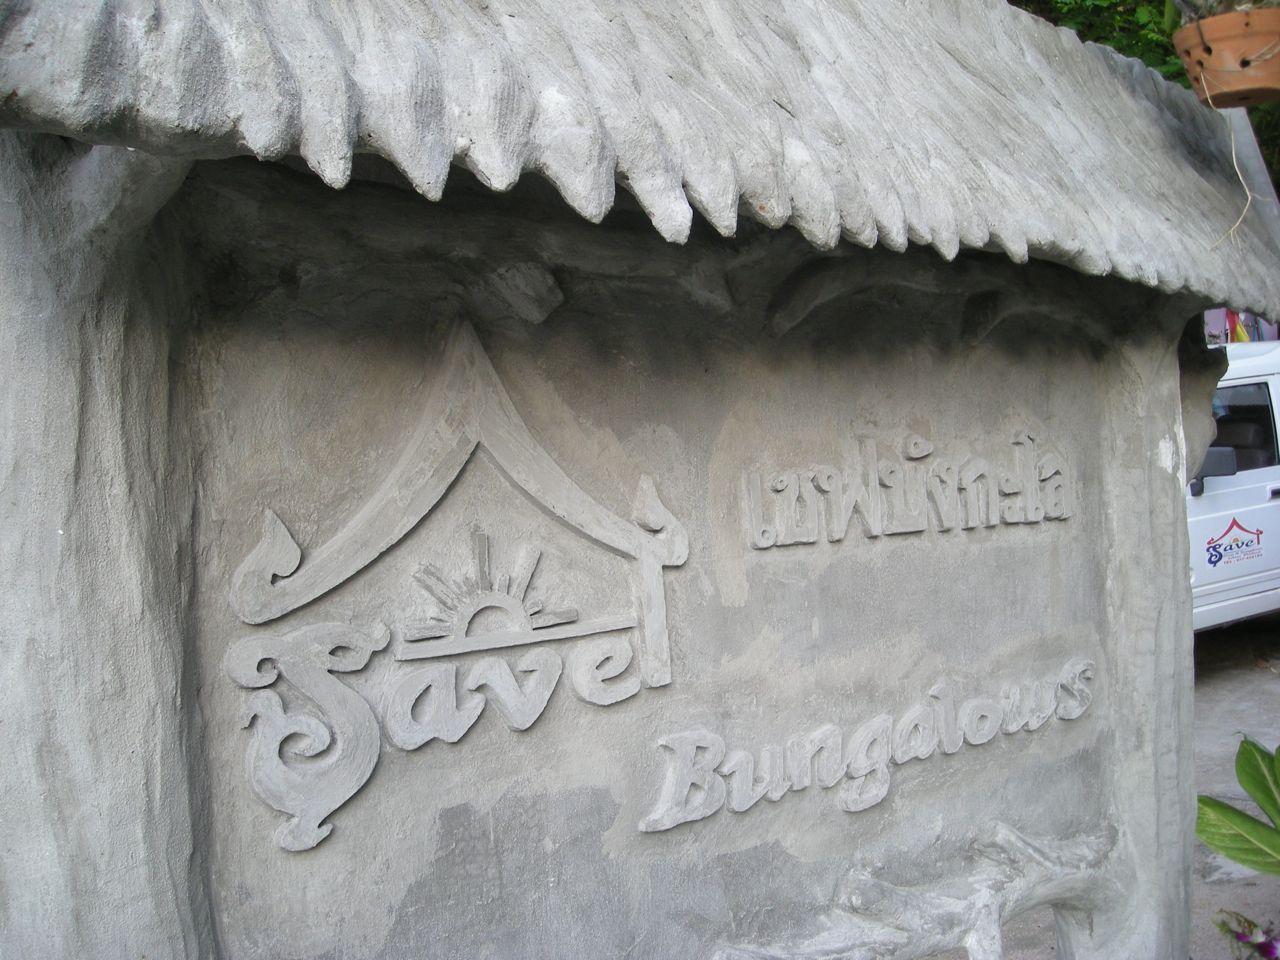 Savel Bungalows